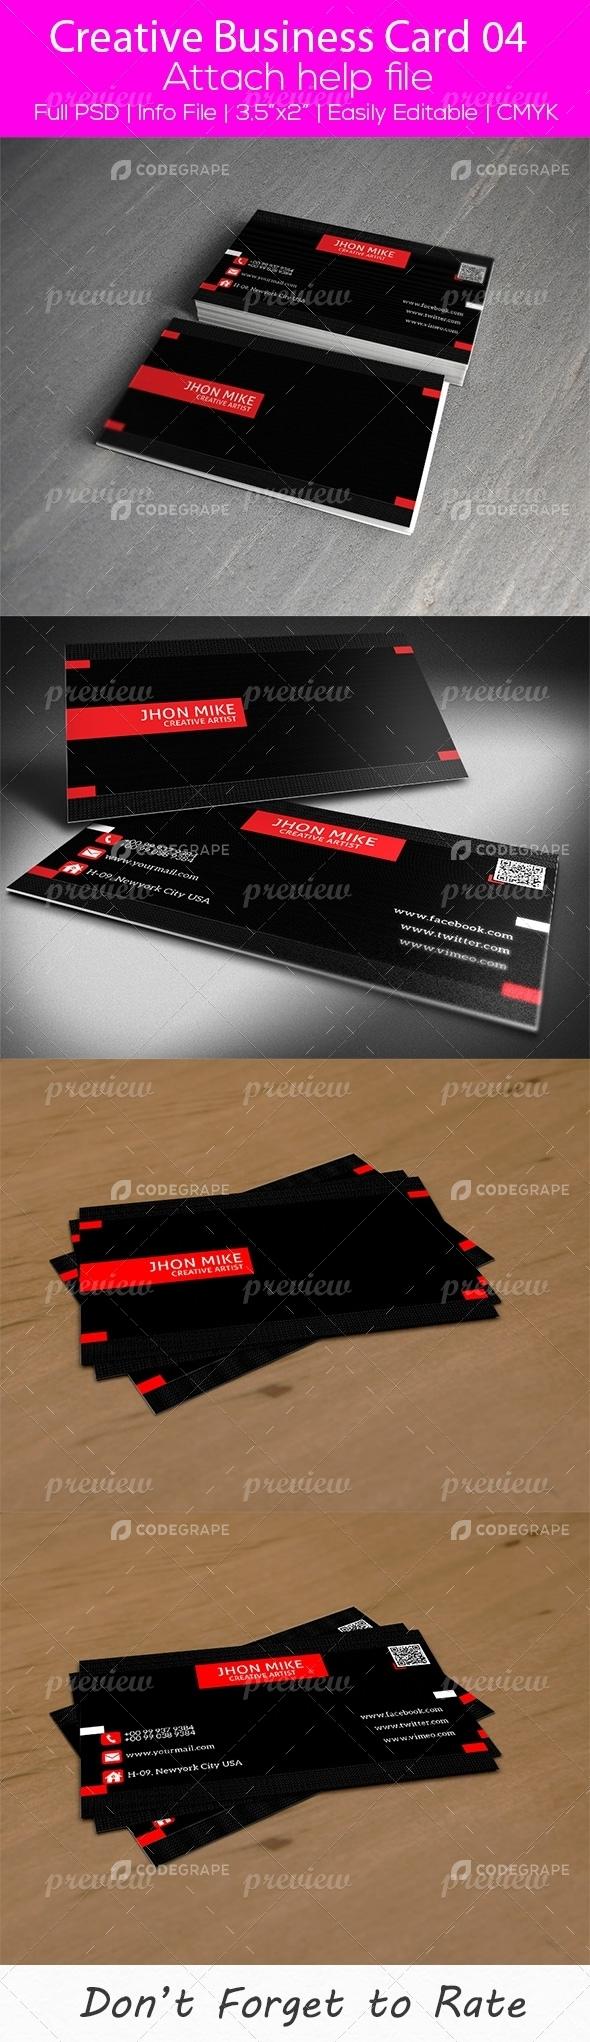 Creative Business Card 04